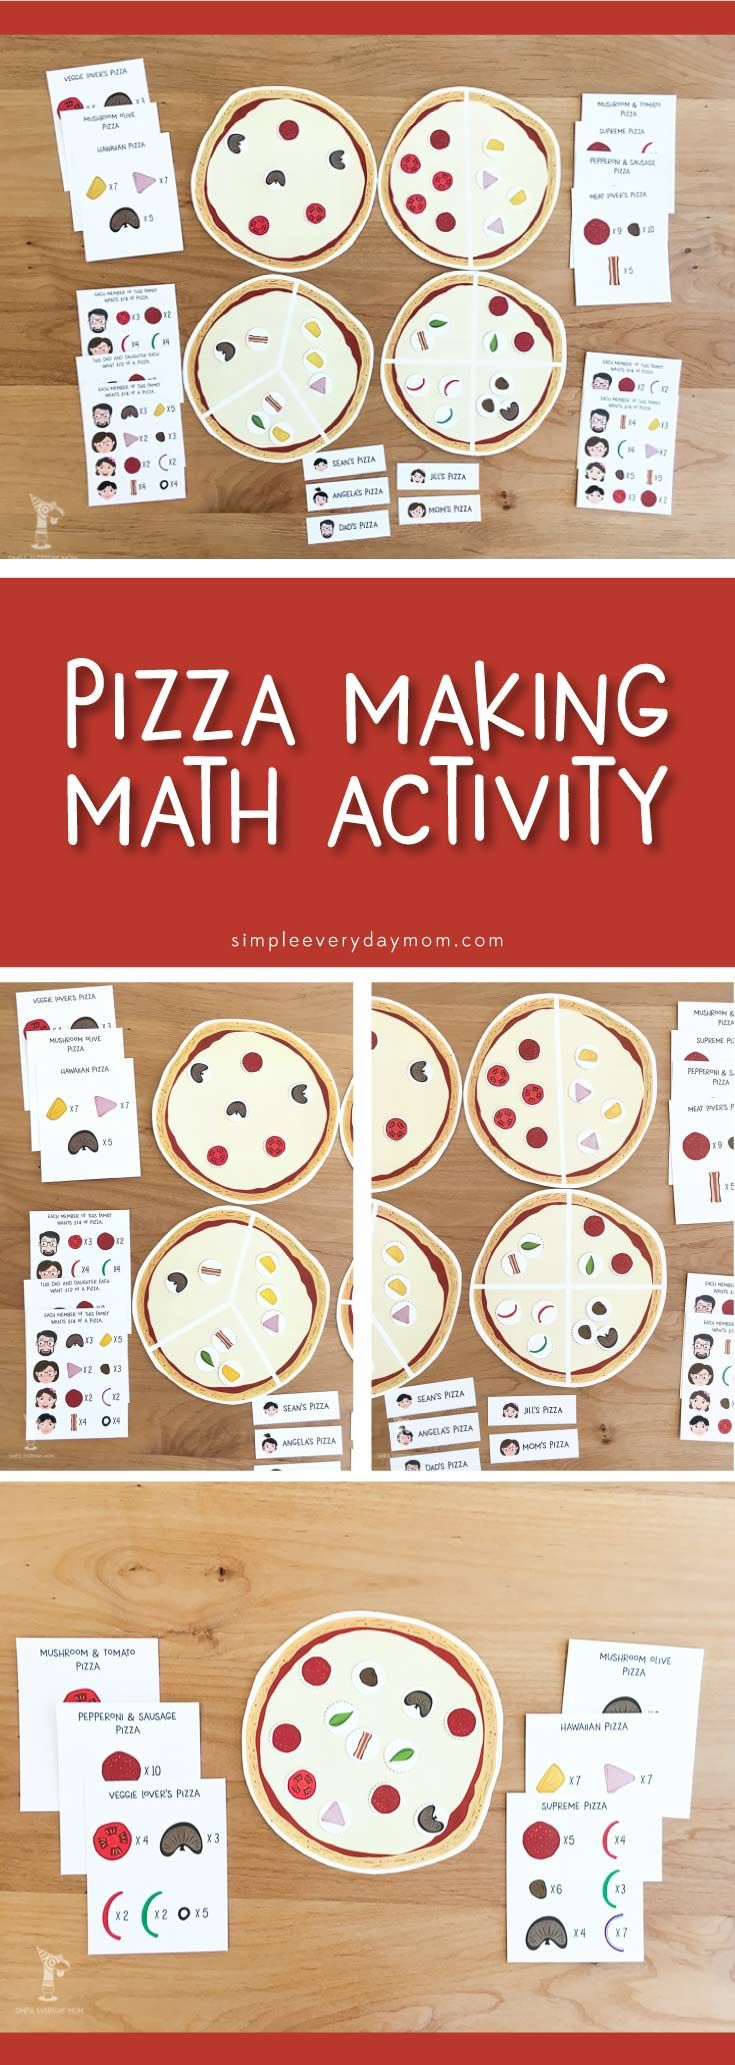 Fun Pizza Activities For Kids That Teach Math Concepts Activities For Kids Math Games For Kids Math Concepts [ 2065 x 735 Pixel ]